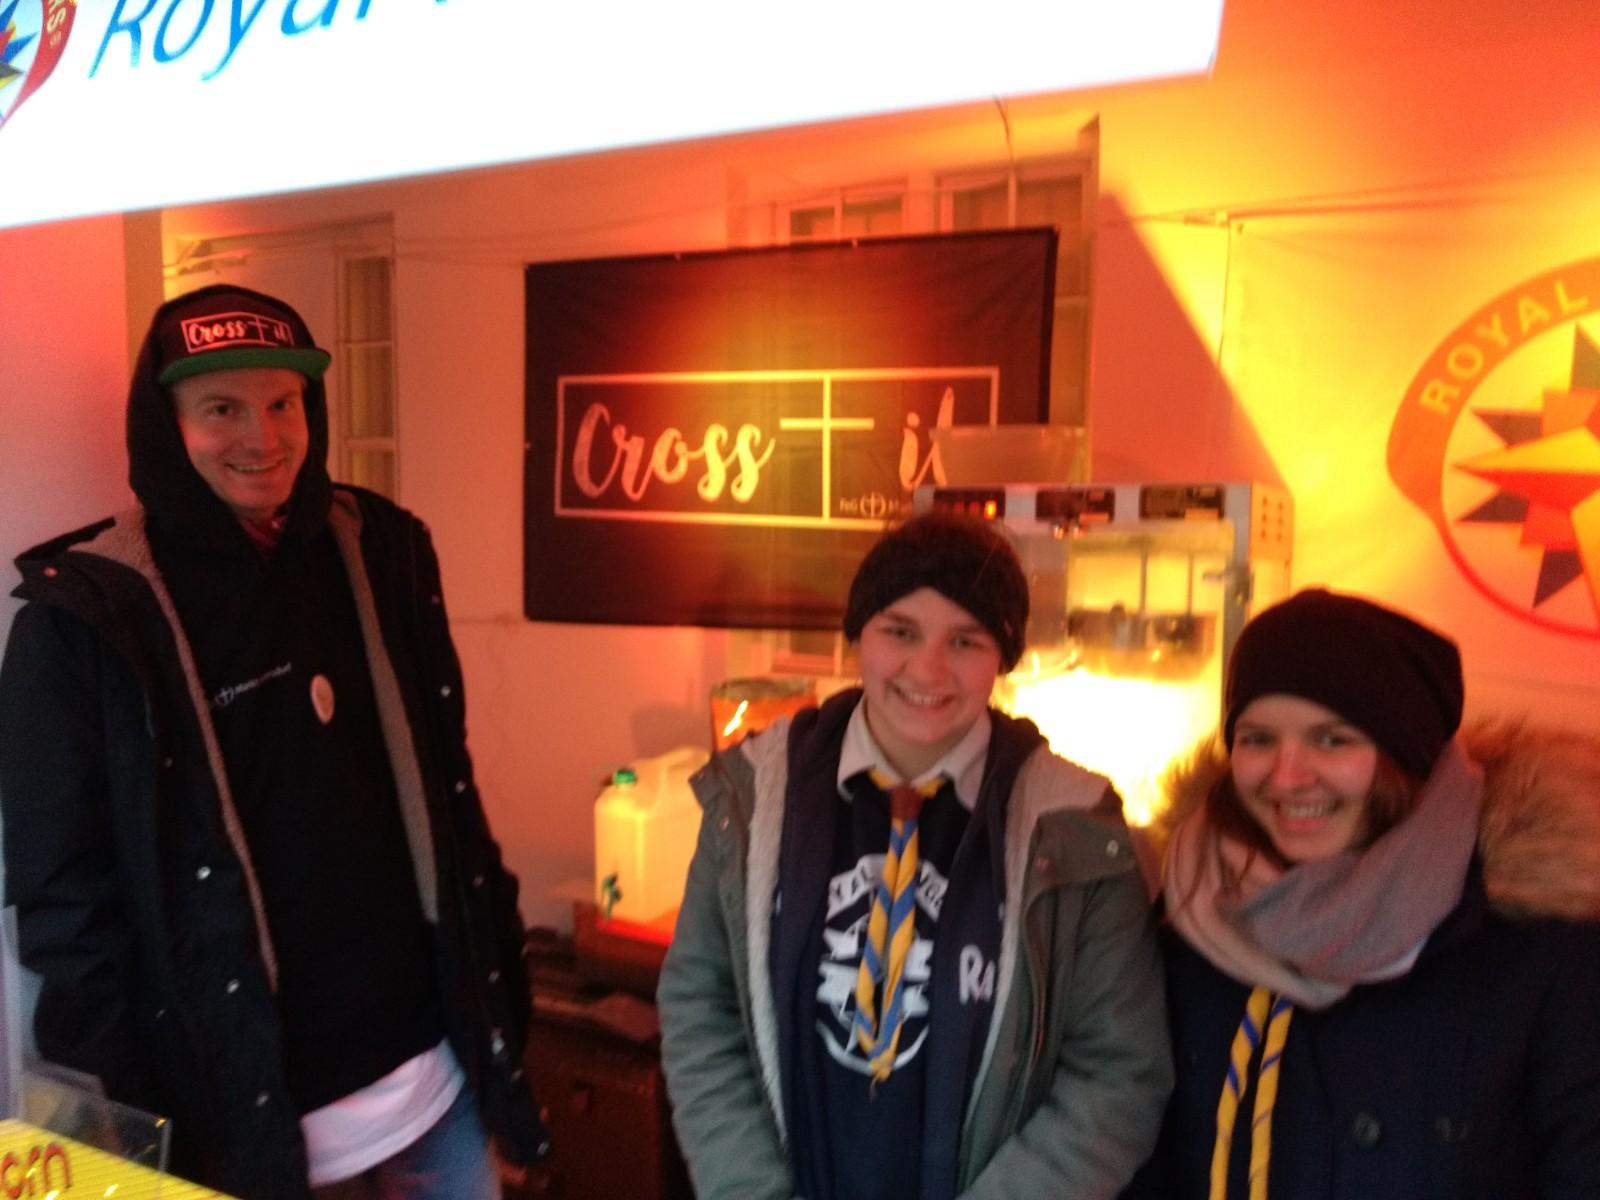 cross it - Christkindlmarkt in Markt Indersdorf - Stand Team